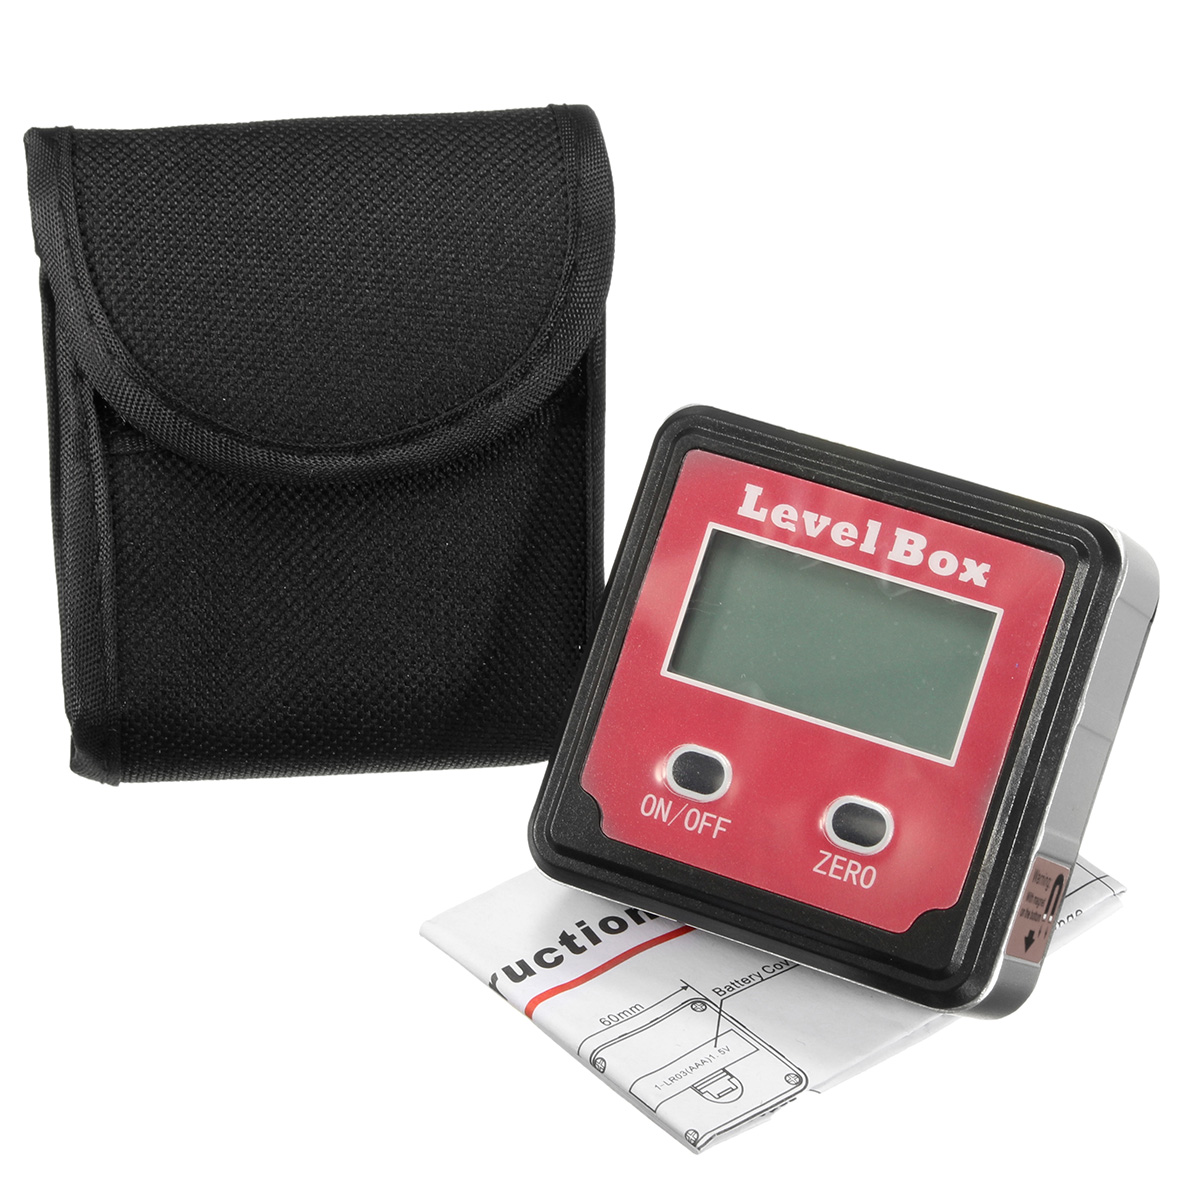 Raitool Magnetic Bubble Spirit Level Digital Angle Finder Gauge Protractor Inclinometer Level Box